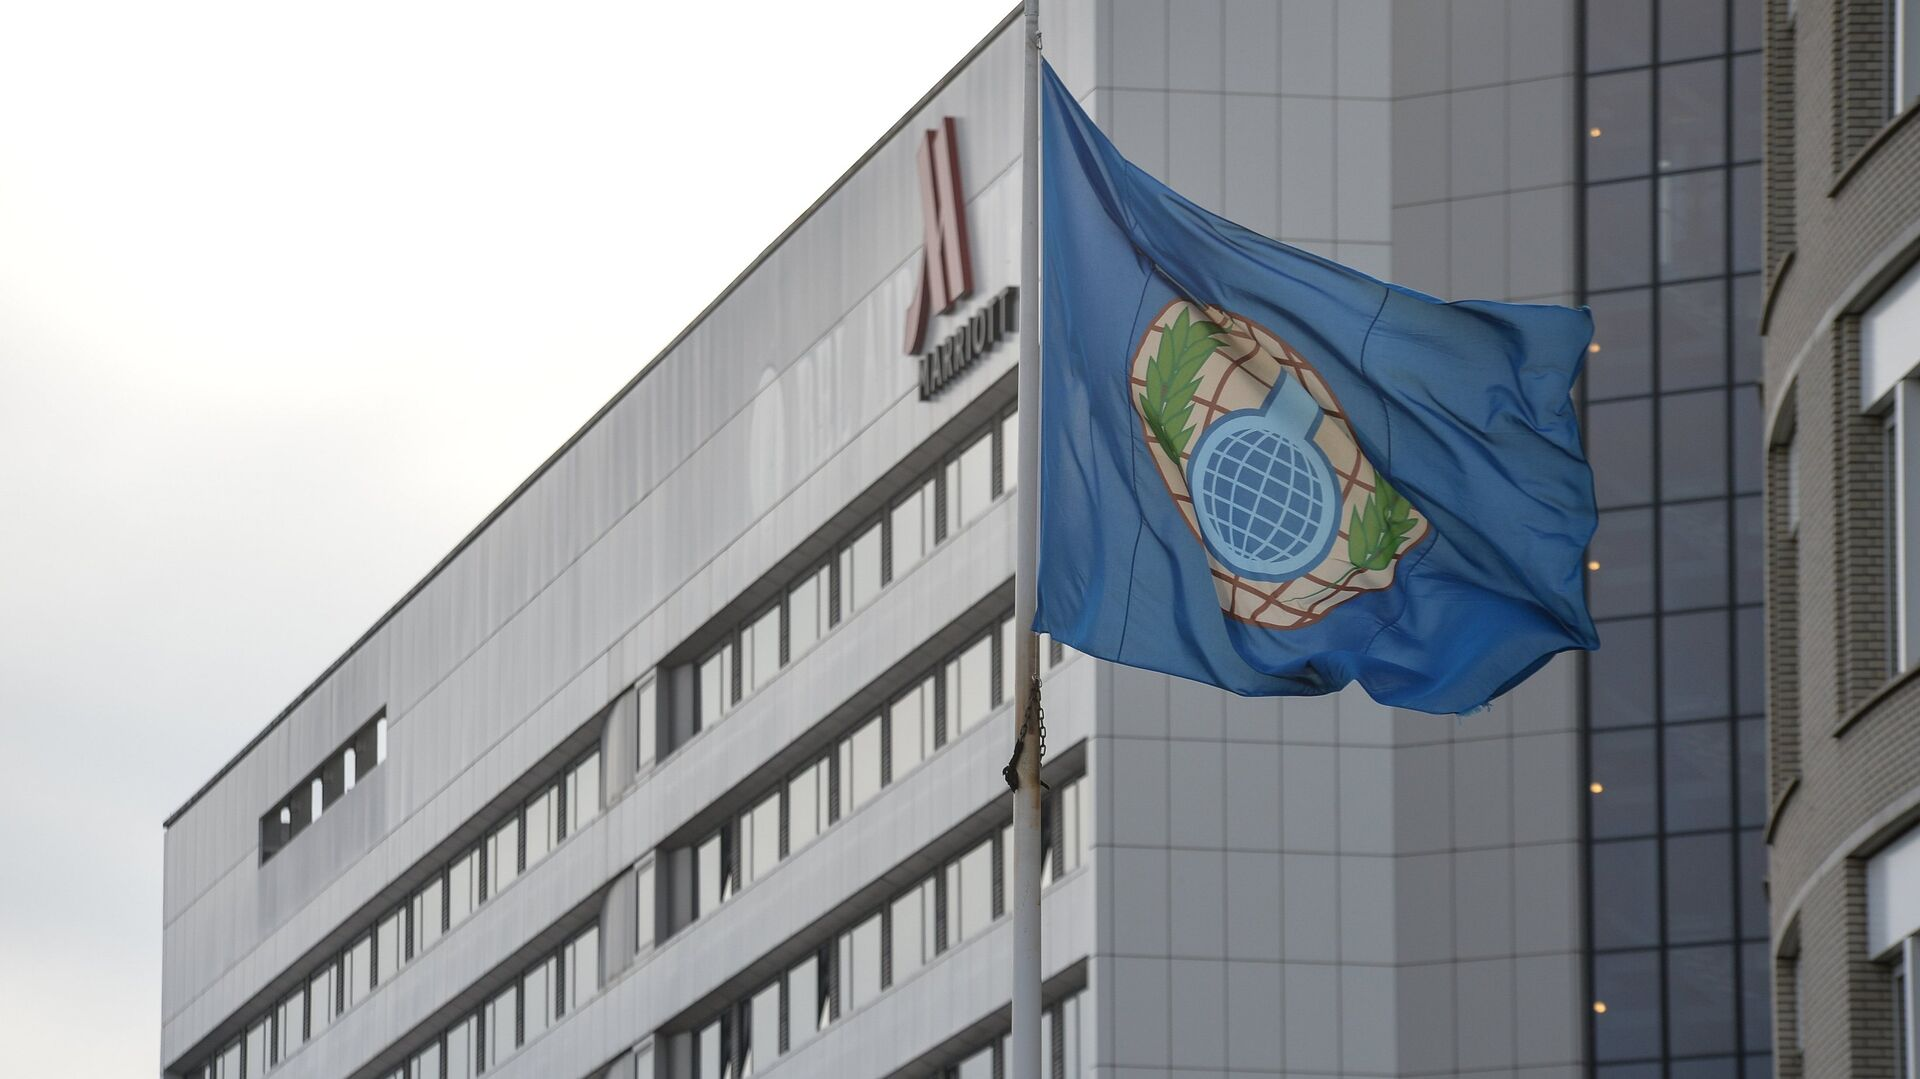 Bandera de la OPAQ - Sputnik Mundo, 1920, 20.04.2021